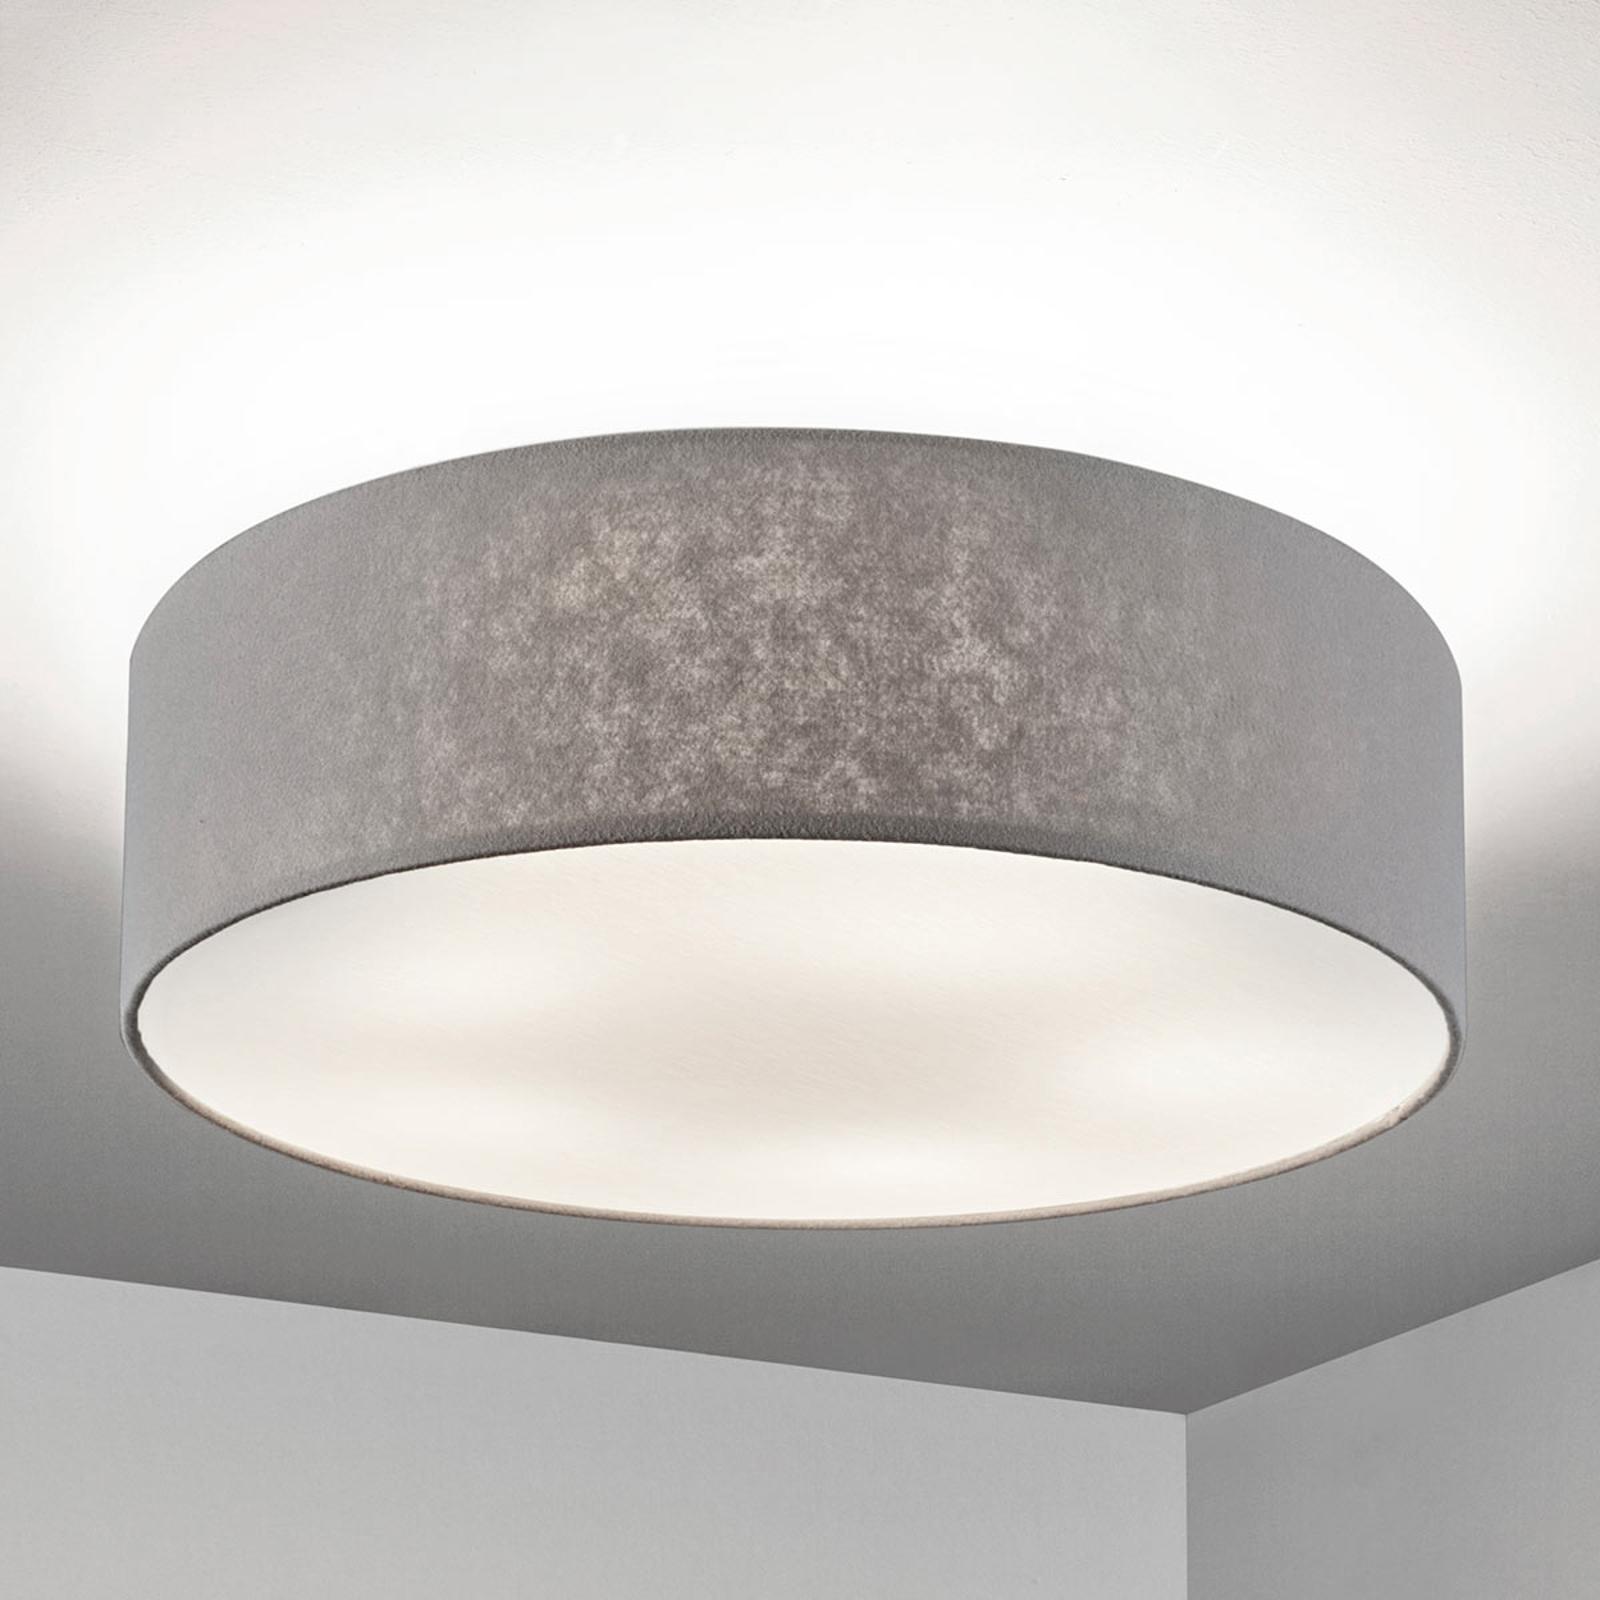 Taklampe Gala, 60 cm, filtskjerm grå